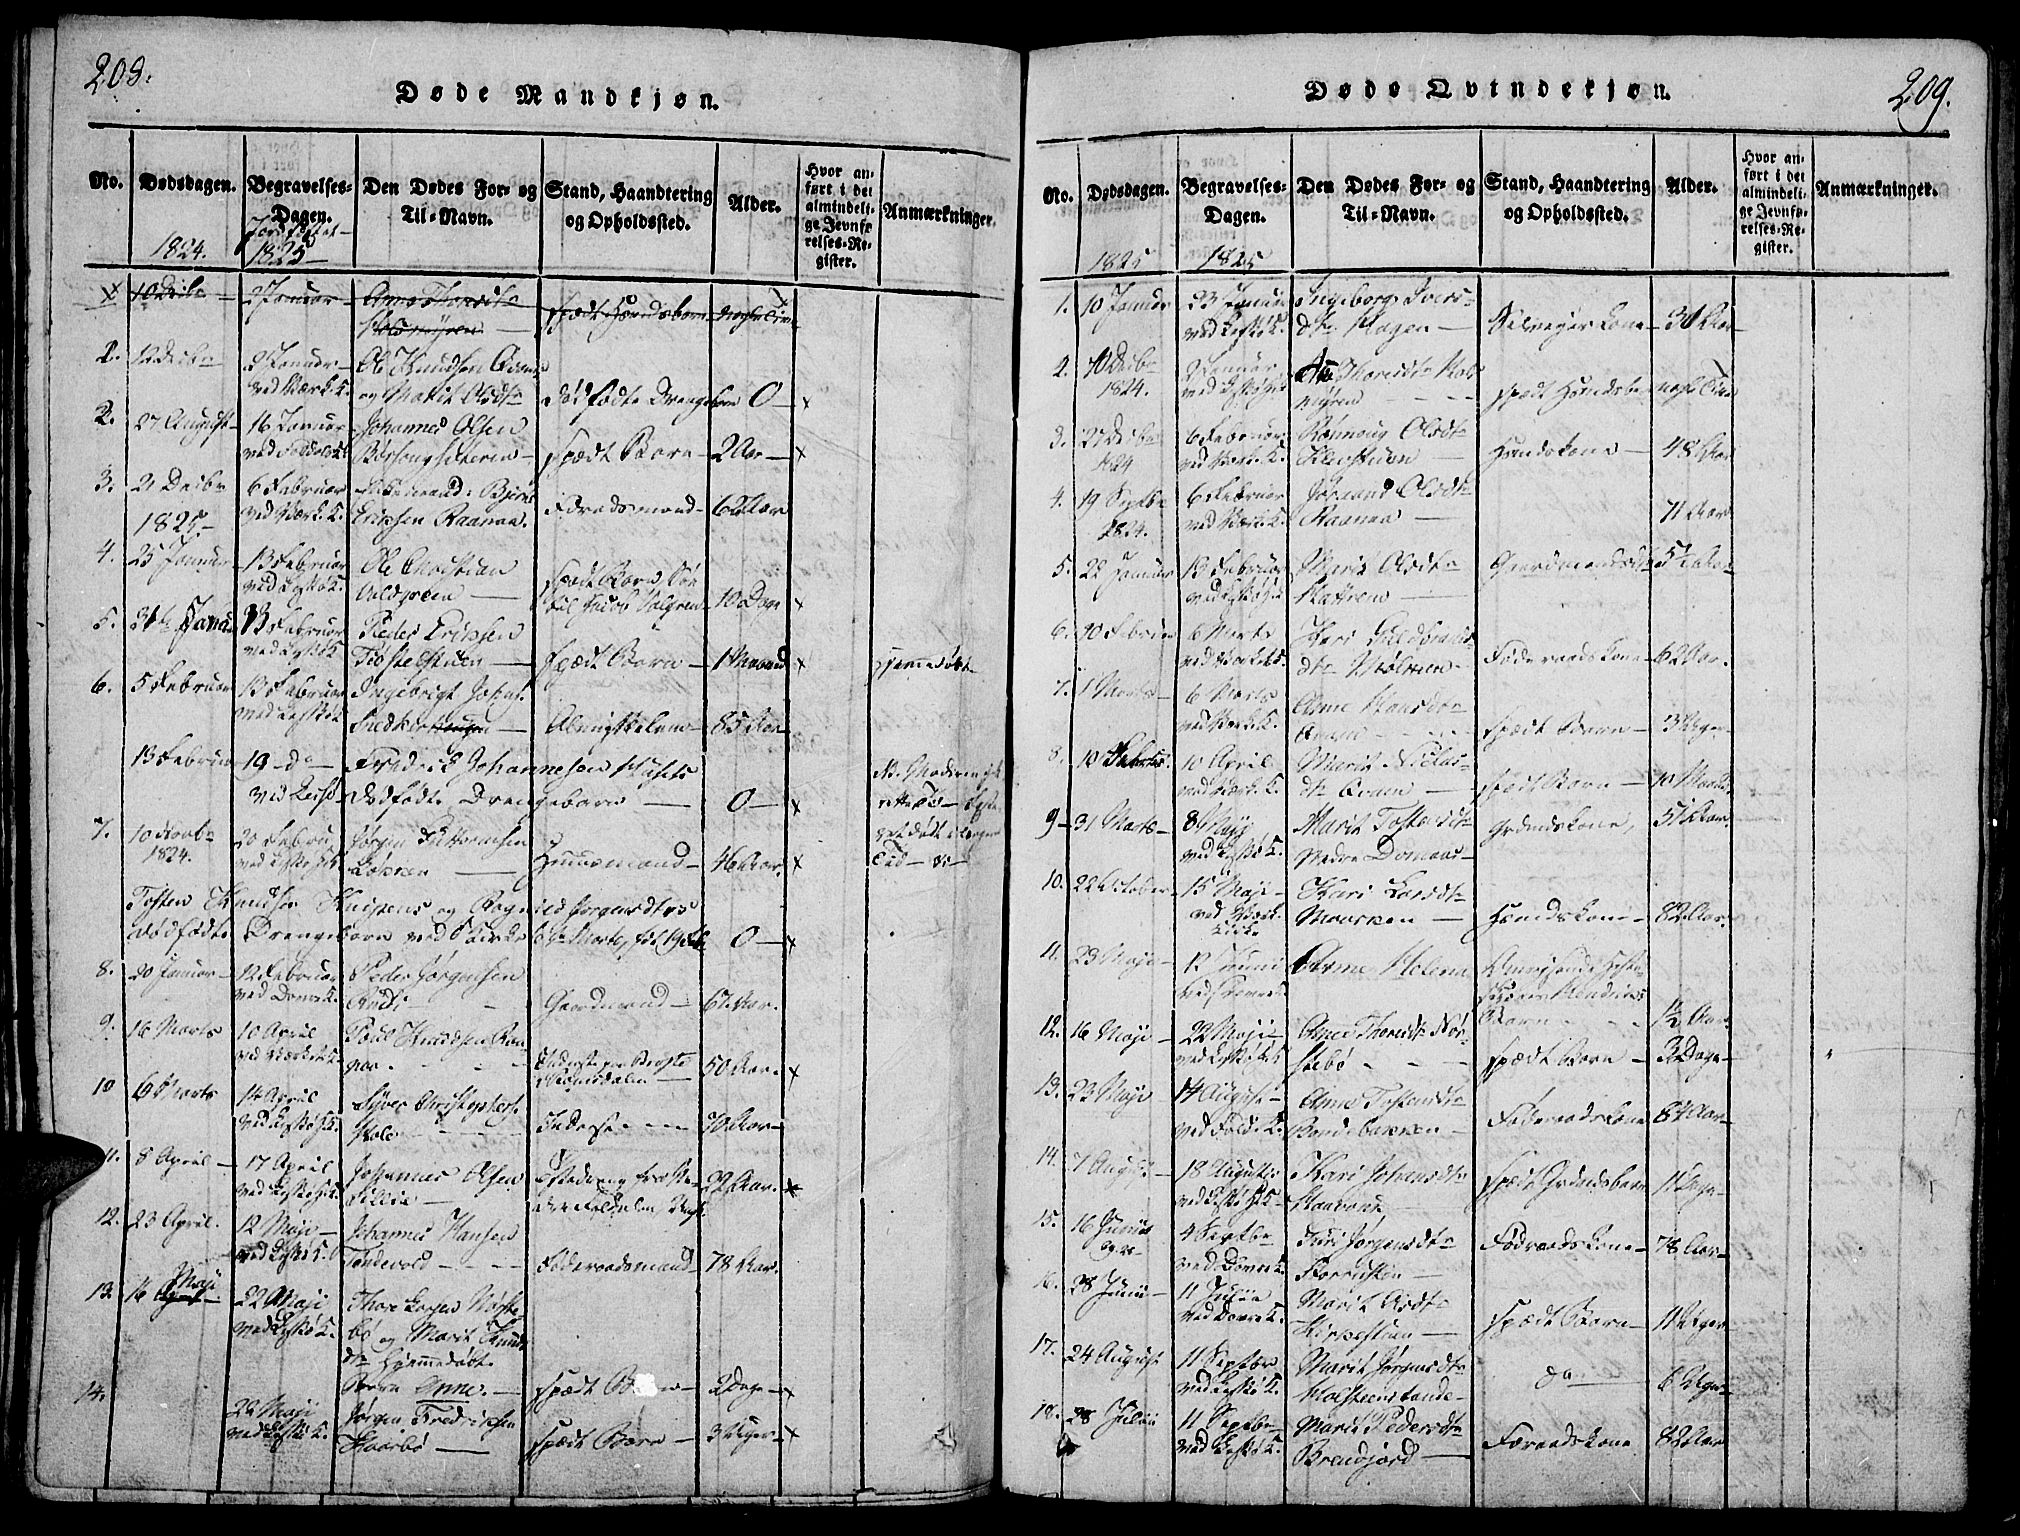 SAH, Lesja prestekontor, Ministerialbok nr. 4, 1820-1829, s. 208-209